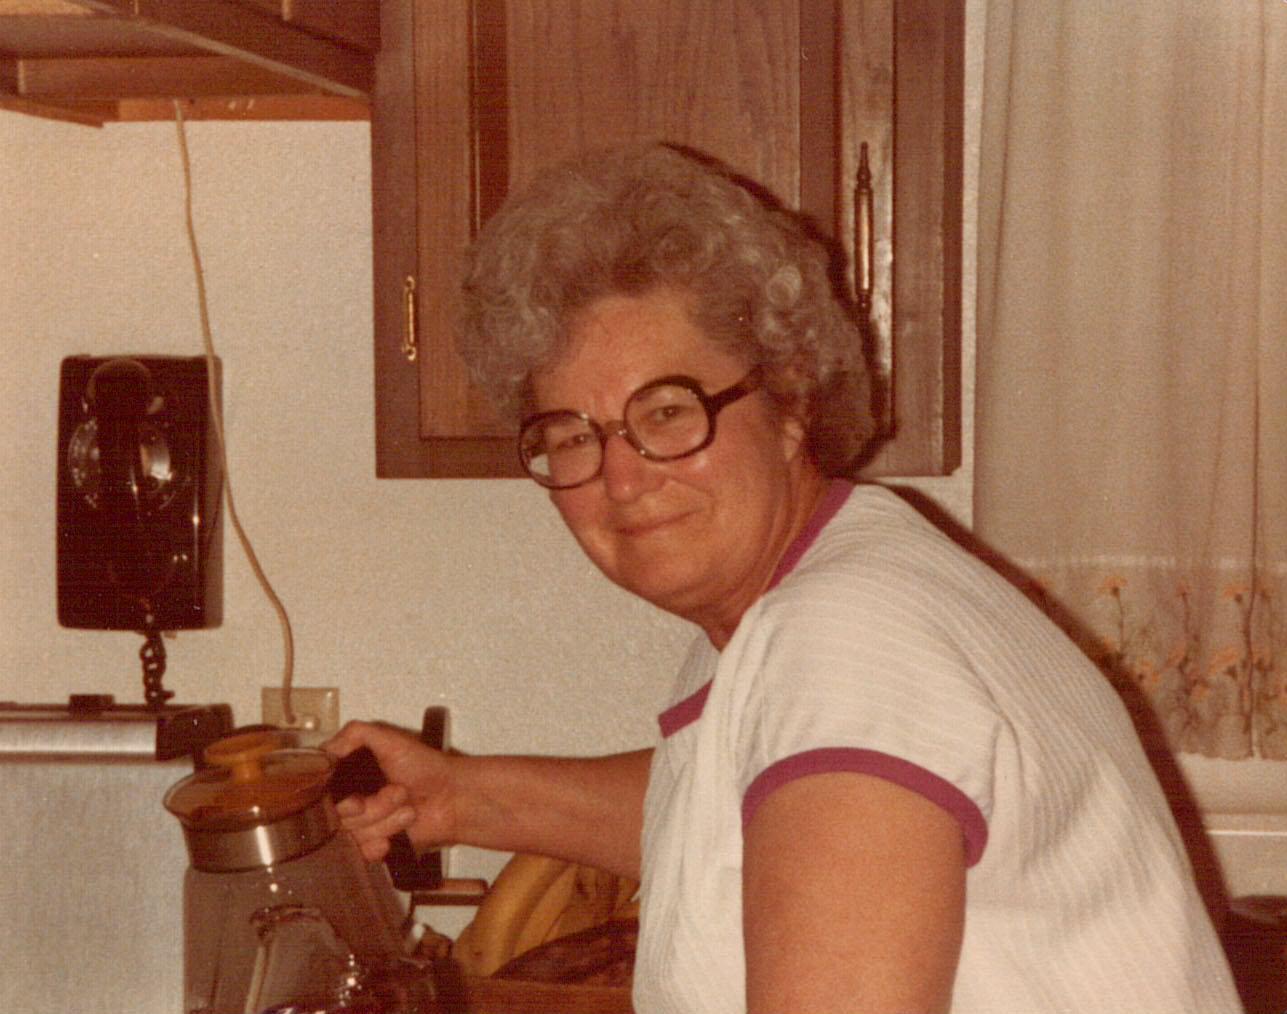 Gracious Hospitality: A Grandparent's Influence KimTurnerMcCulley.com